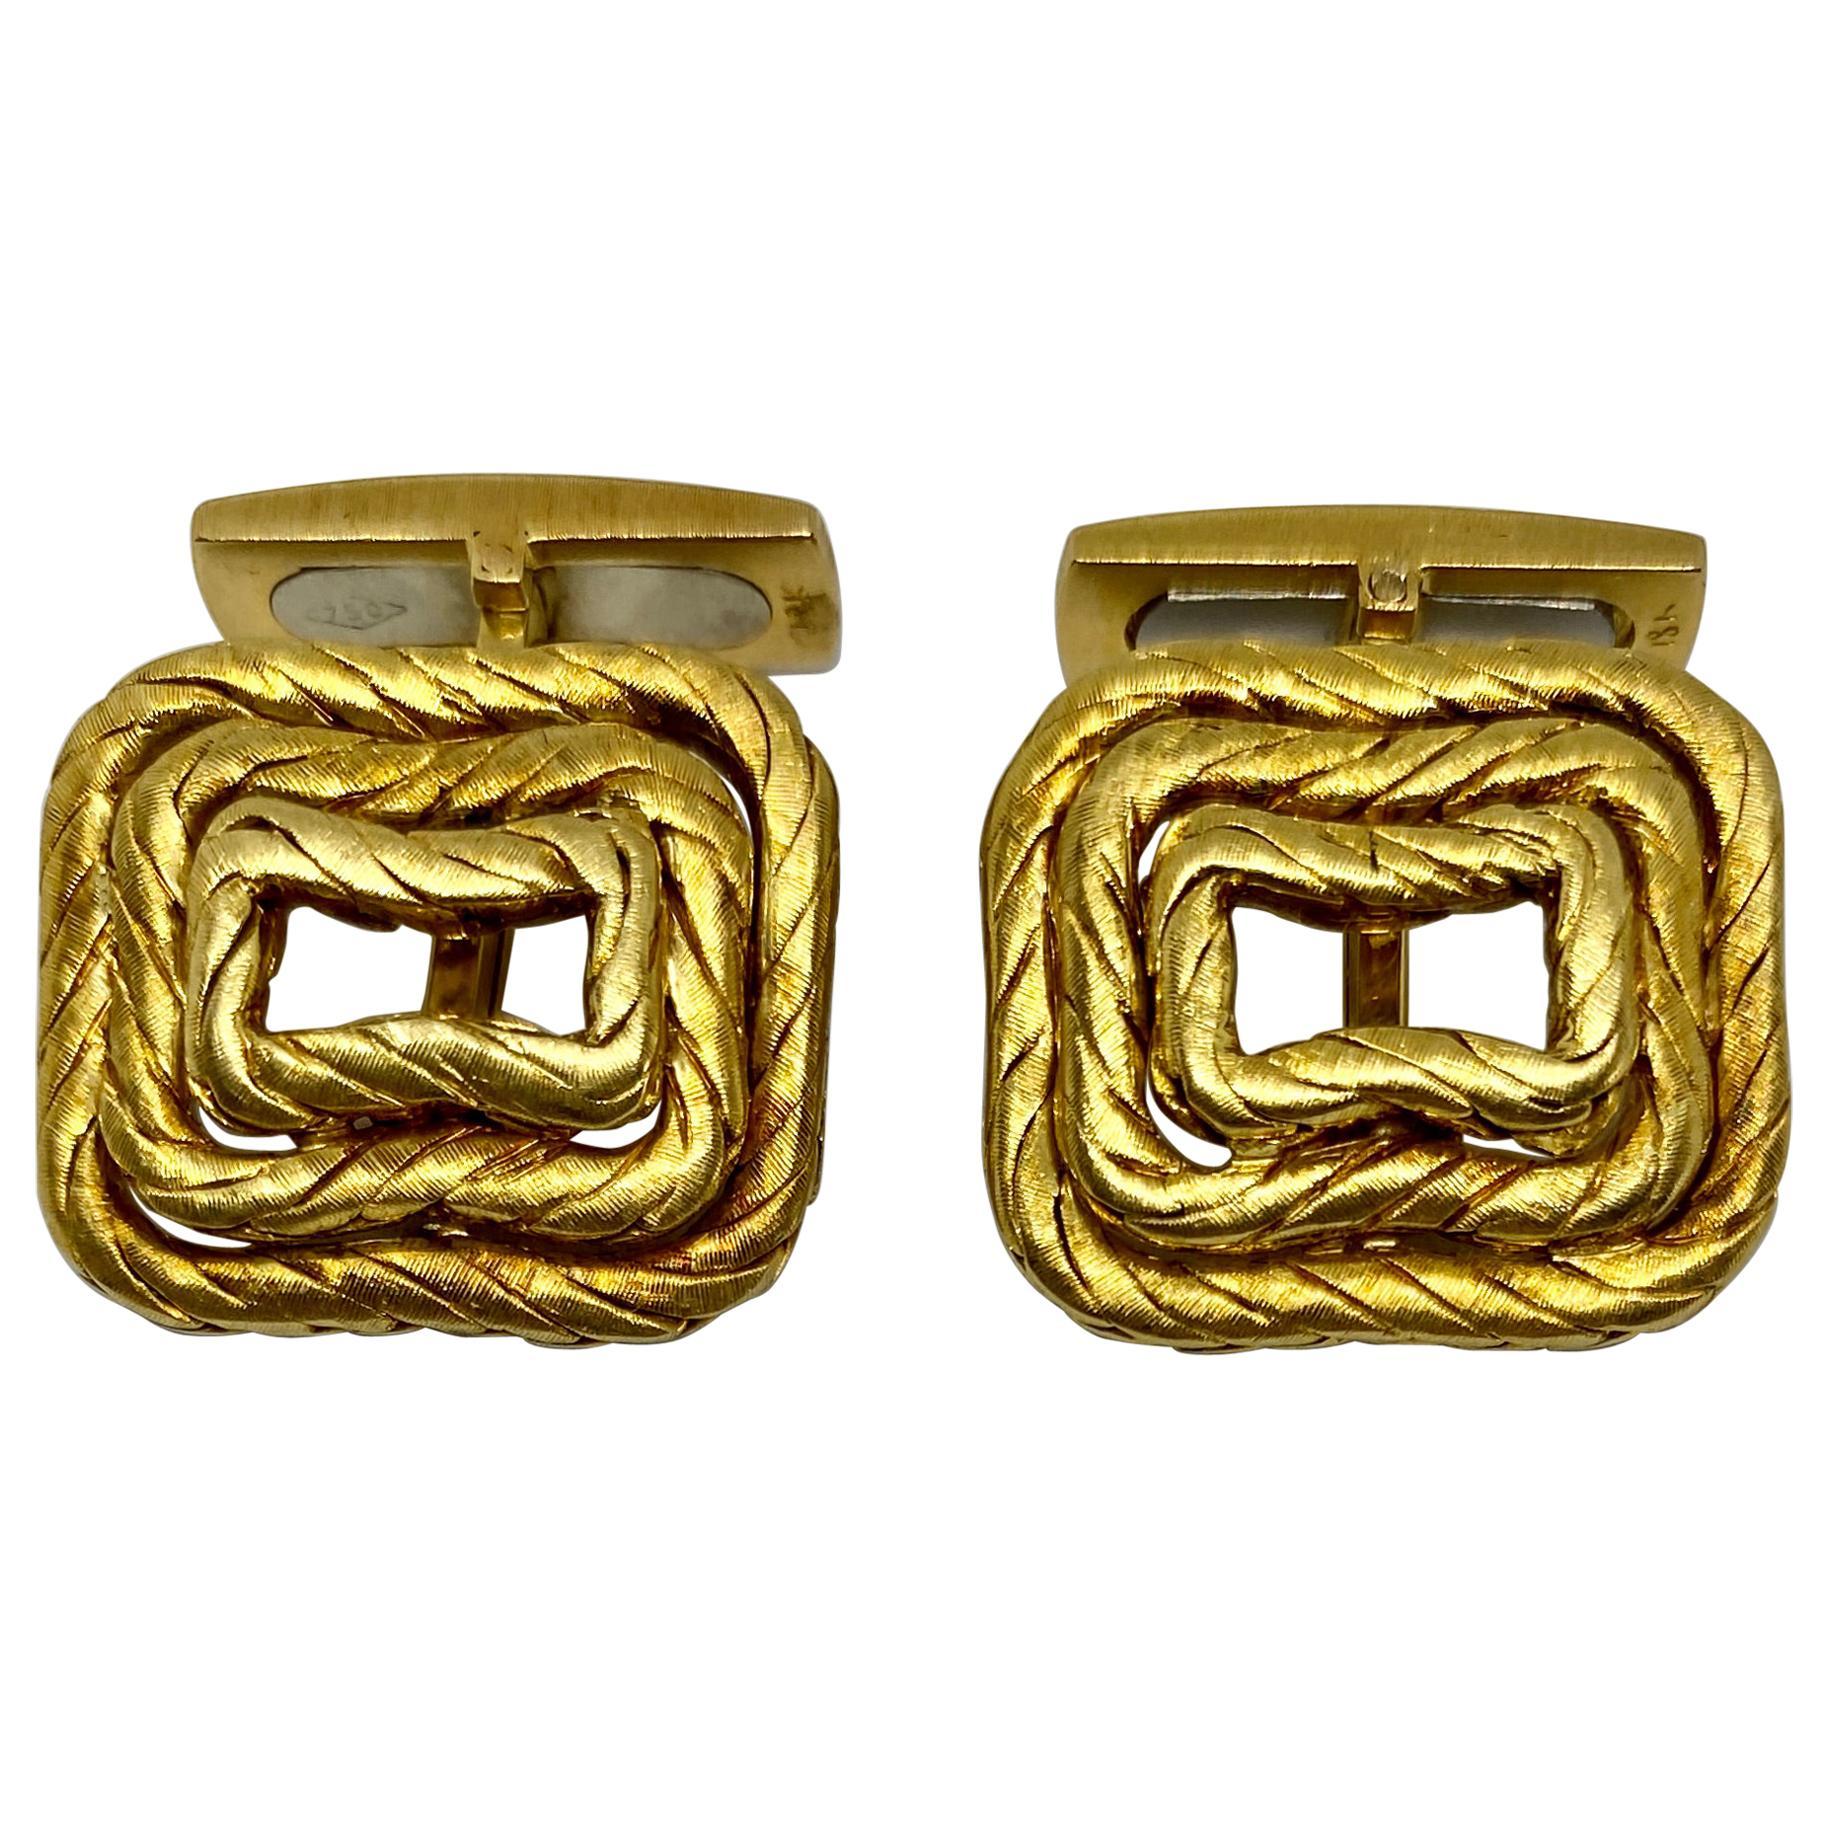 Vintage Cufflinks in 18K Yellow Gold by Buccellati